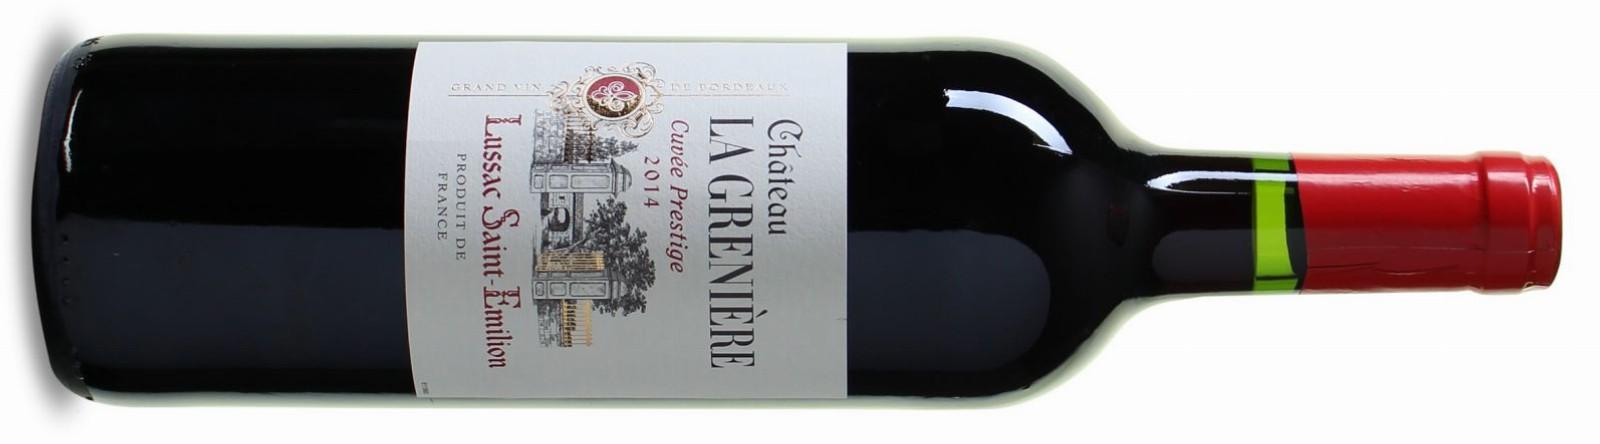 Château La Grenière Cuvée Prestige 2014